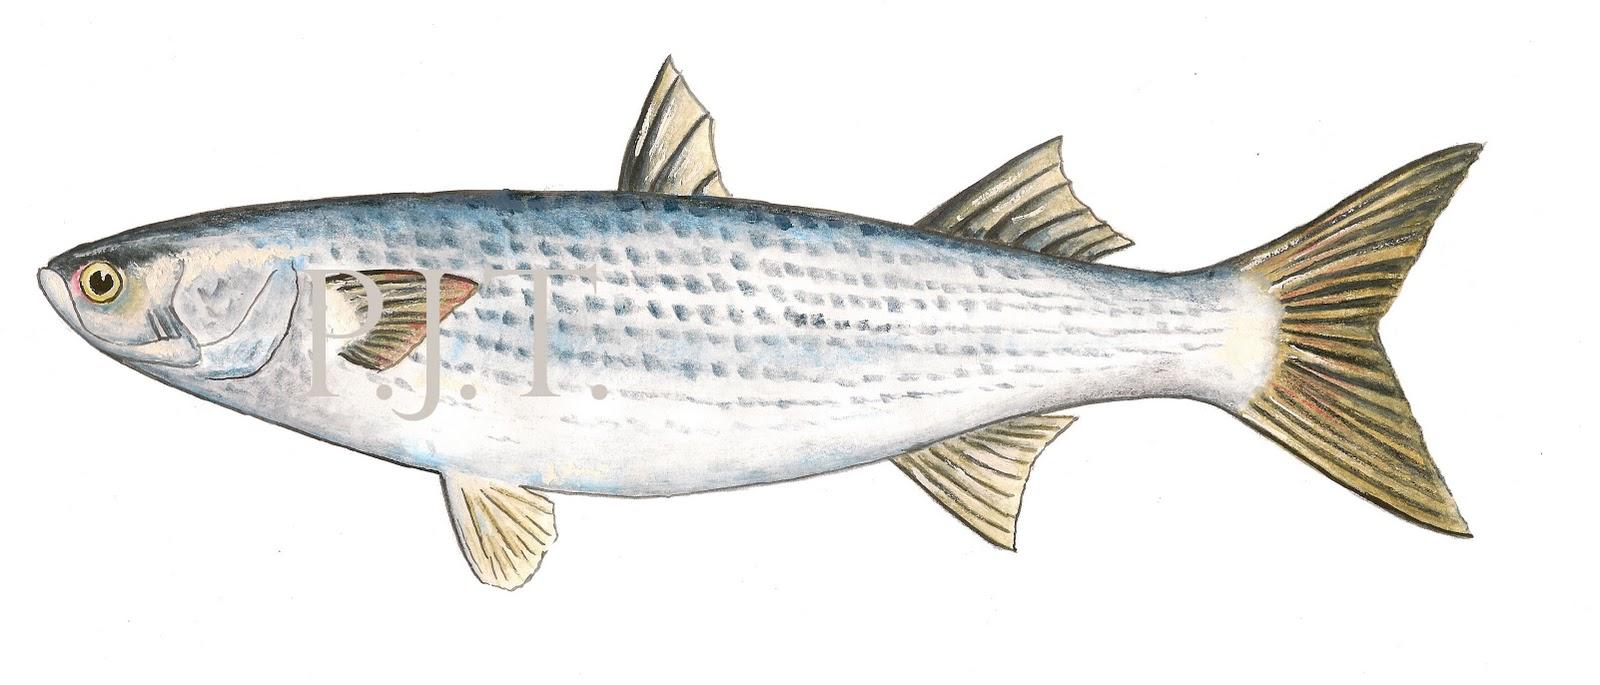 Small mullet fish small mullet fish small mullet fish for Mullet fish florida